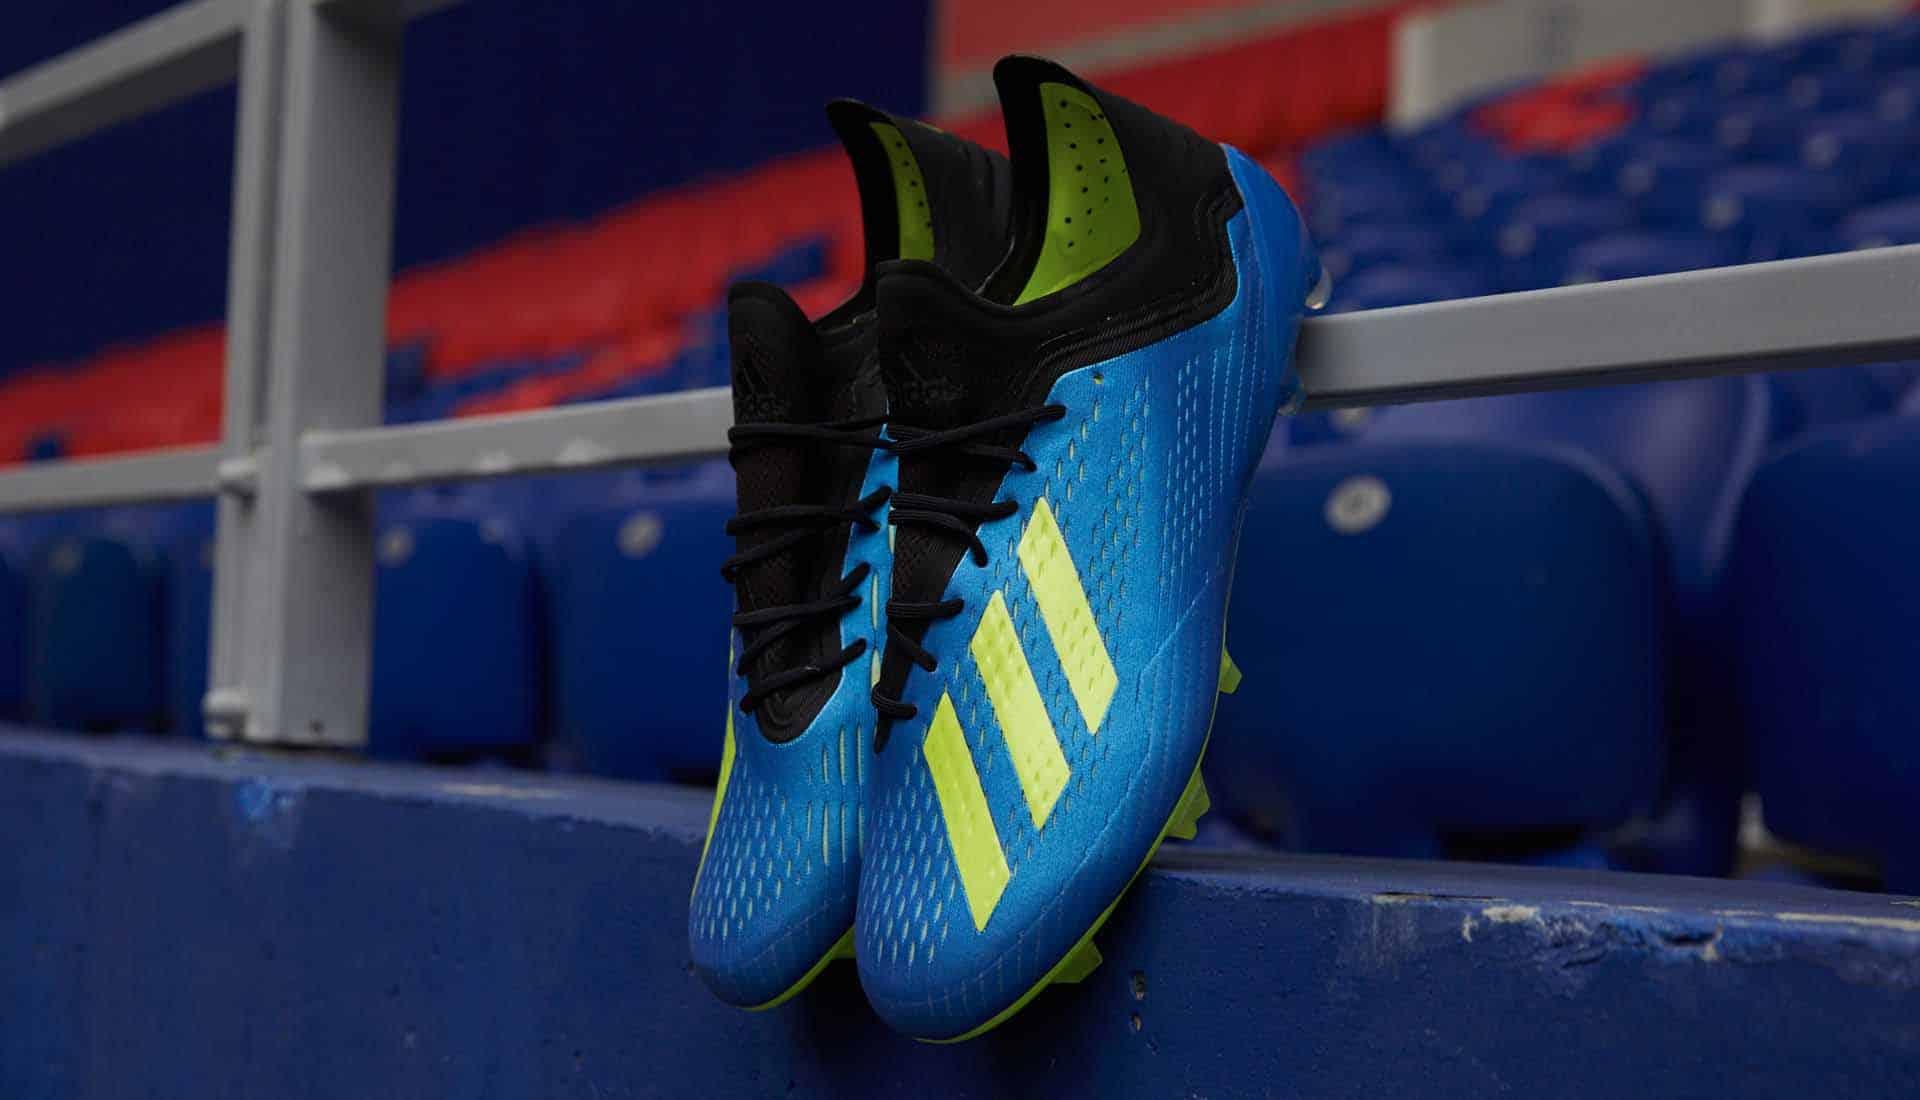 chaussures-football-adidas-X18-1-energy-mode-img3